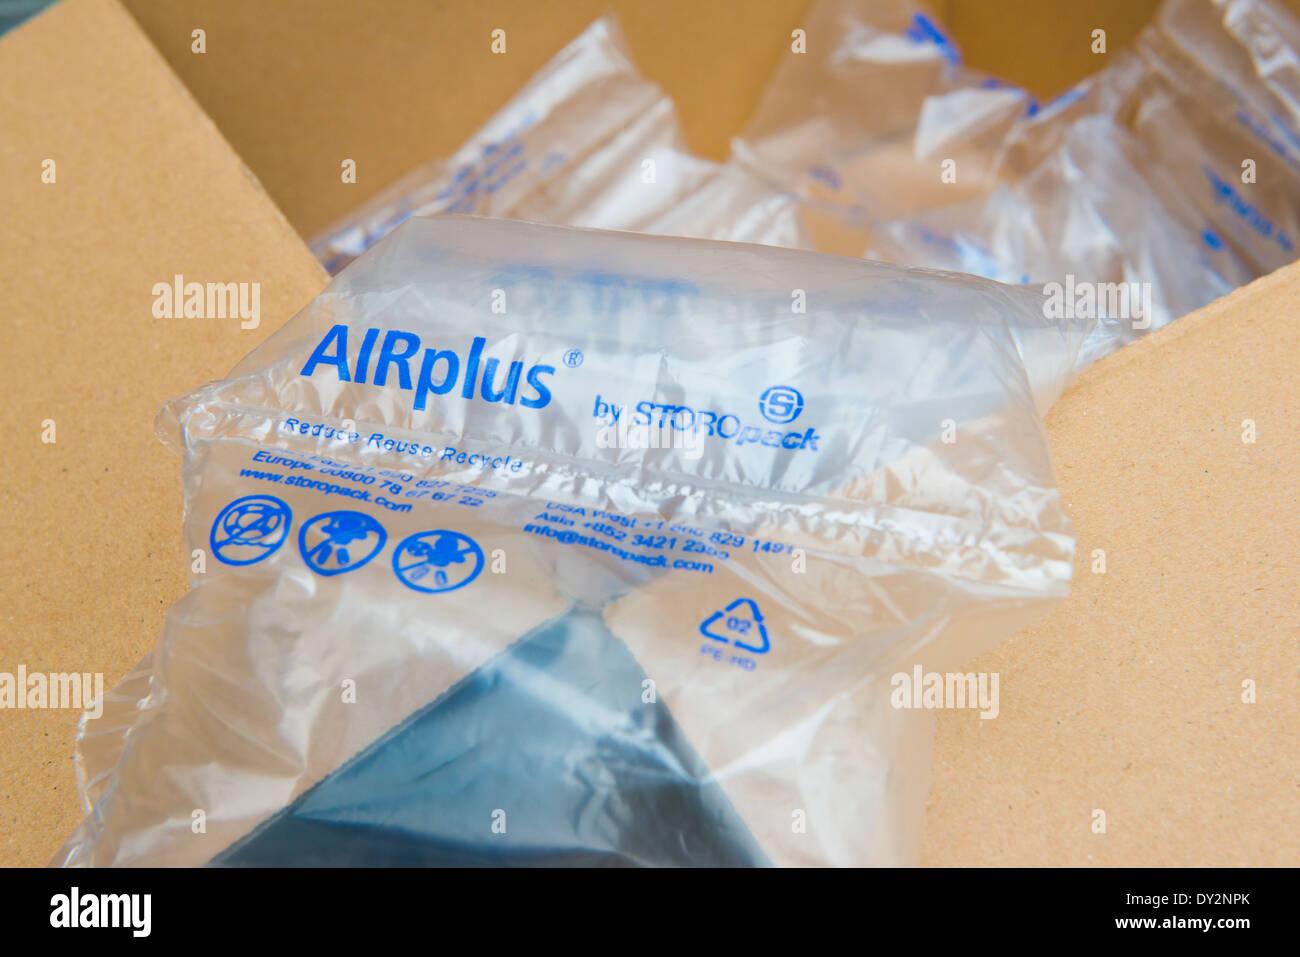 Emballage AIRplus Photo Stock